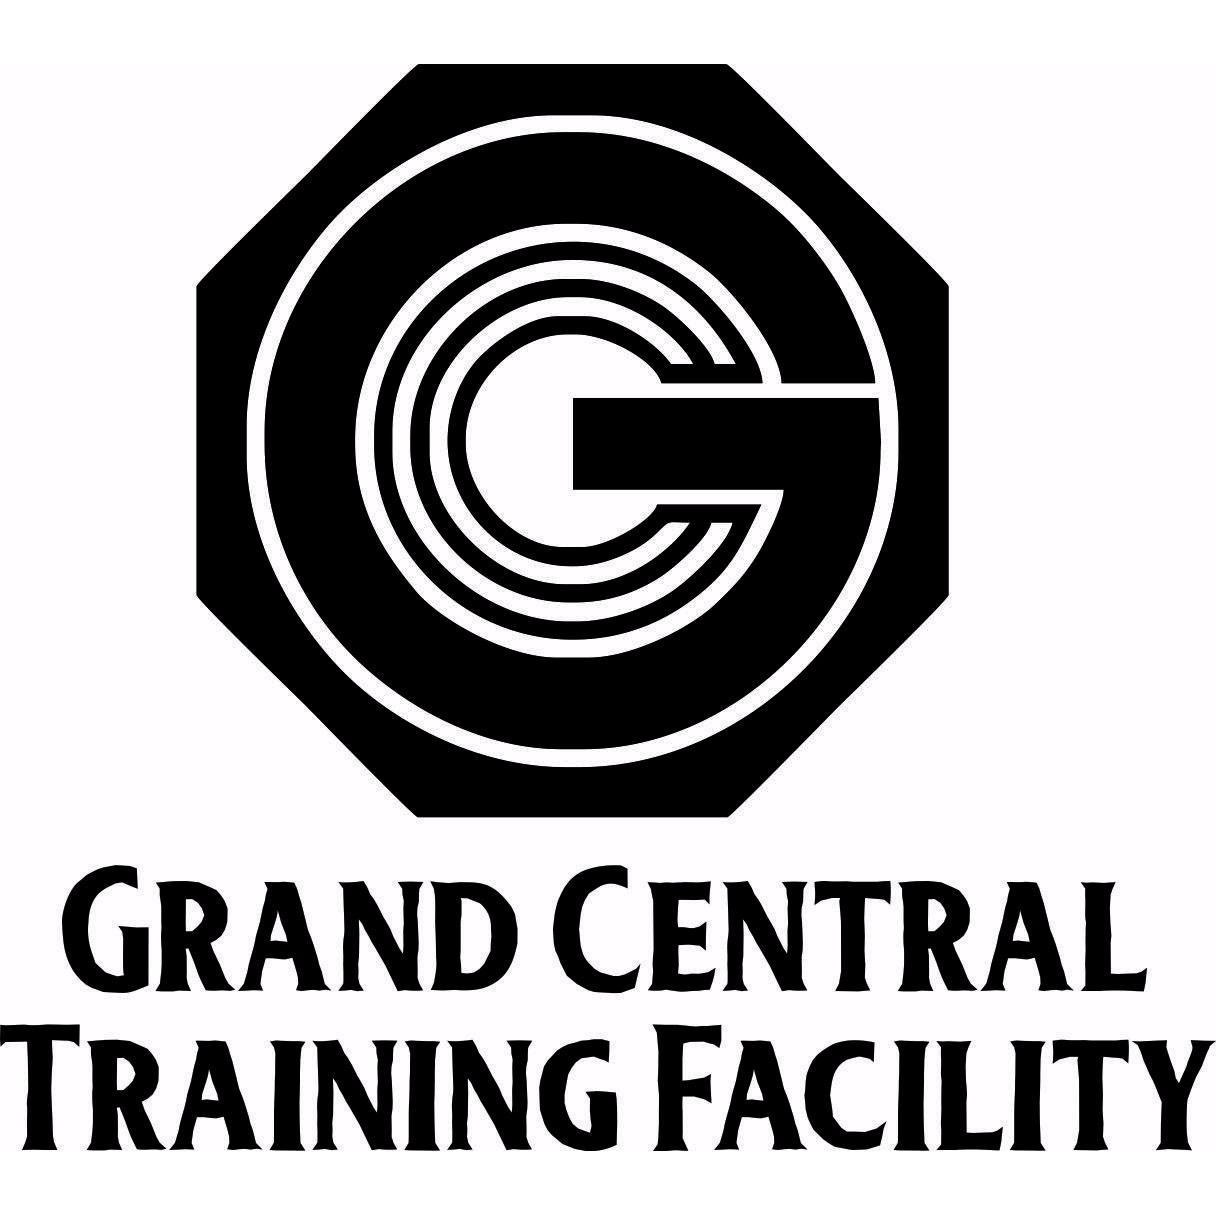 Grand Central Training Facility